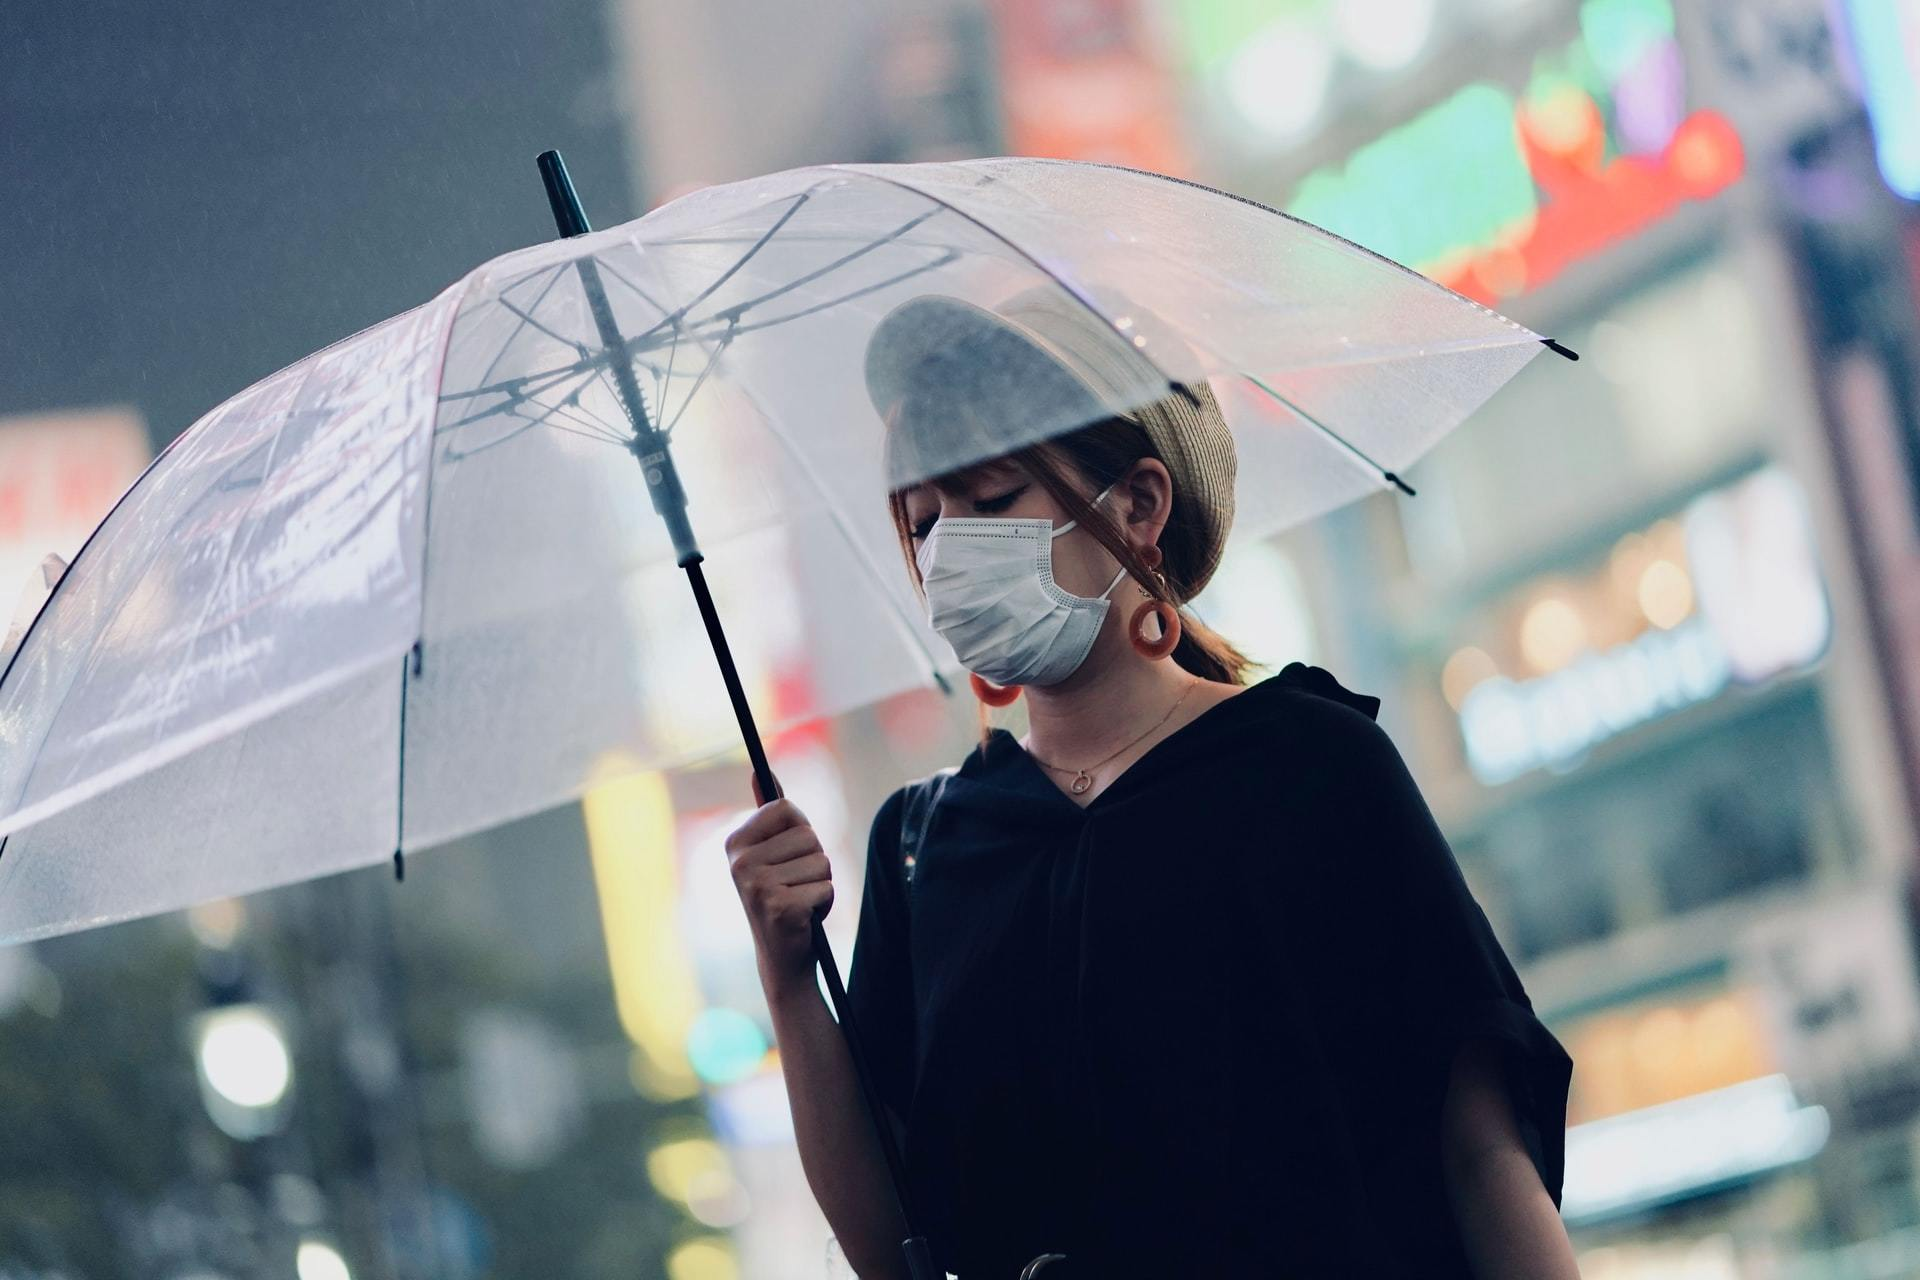 Woman in mask walks with umbrella during coronavirus